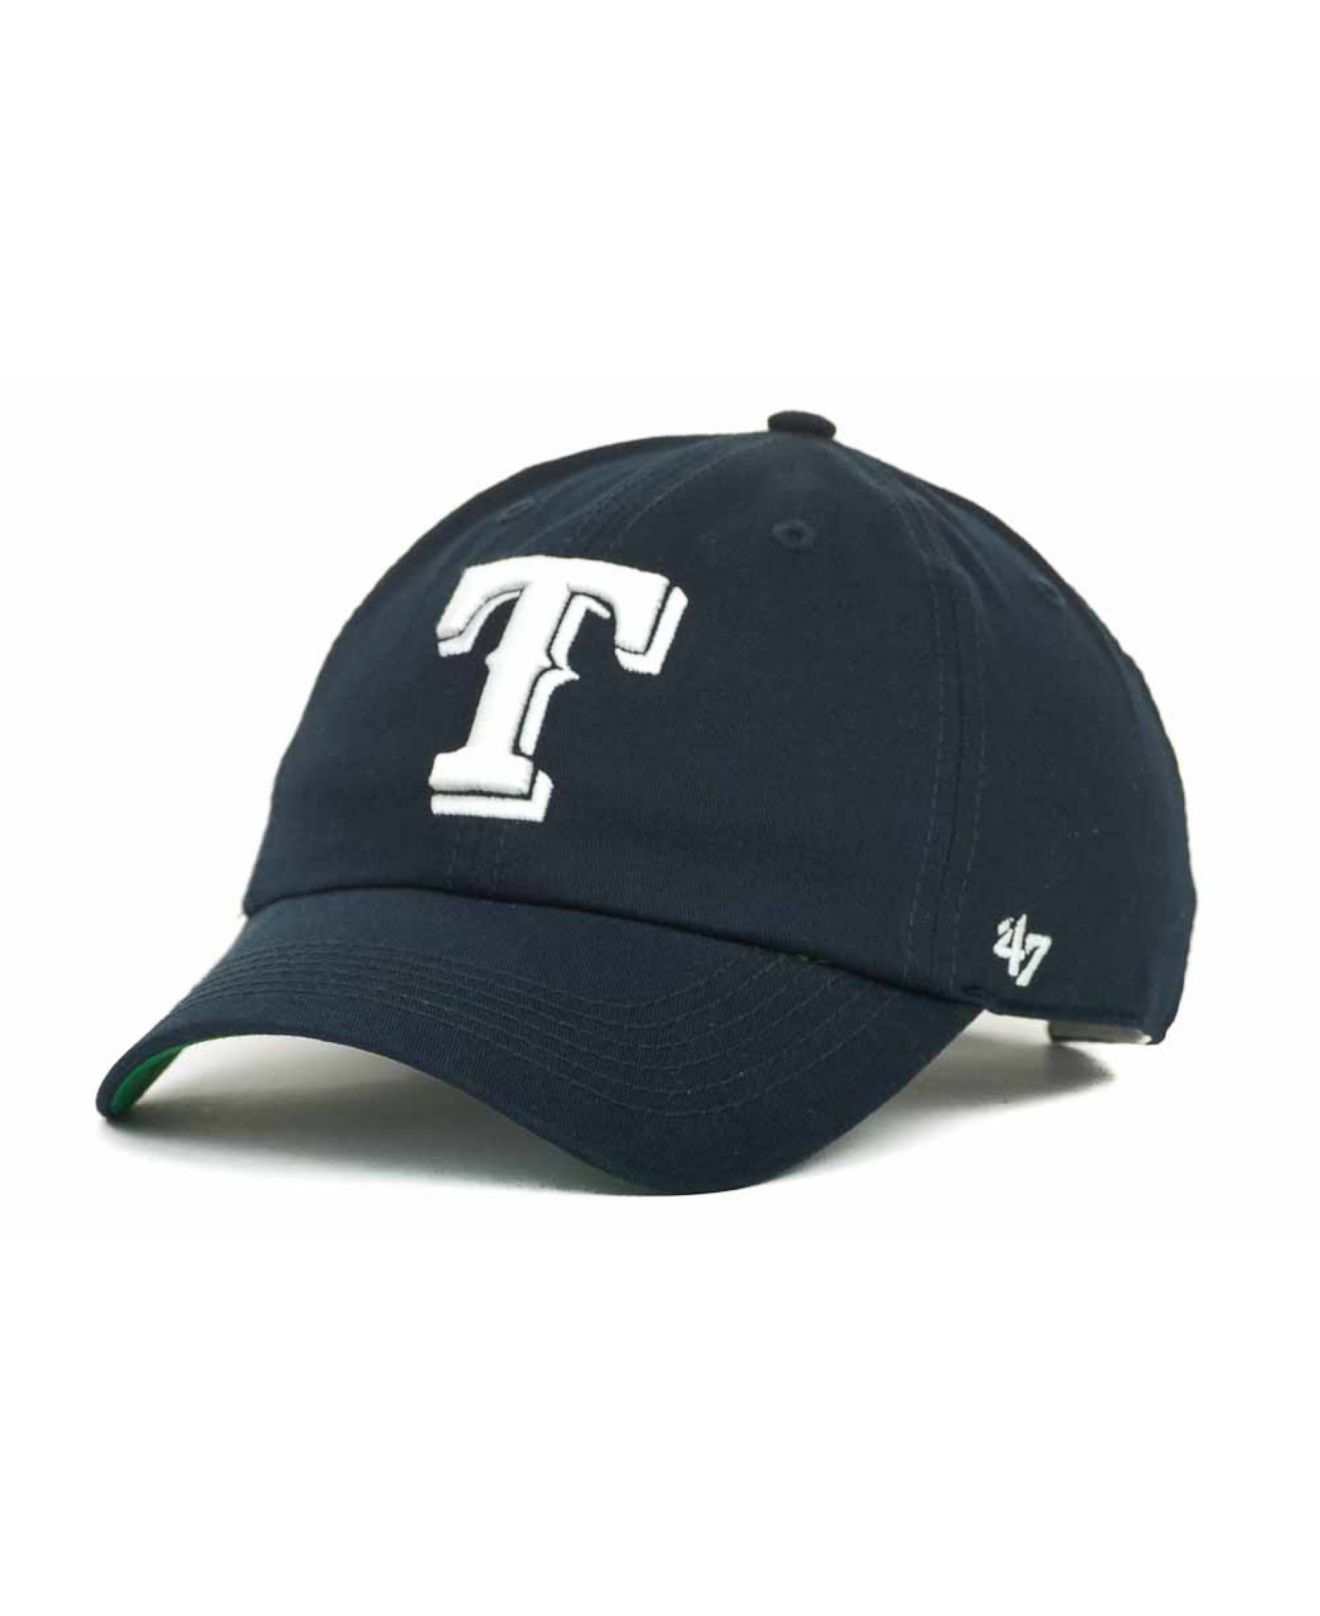 91465aefc65 clearance lyst 47 brand texas rangers bergen ii cap in blue for men a7f47  e1180